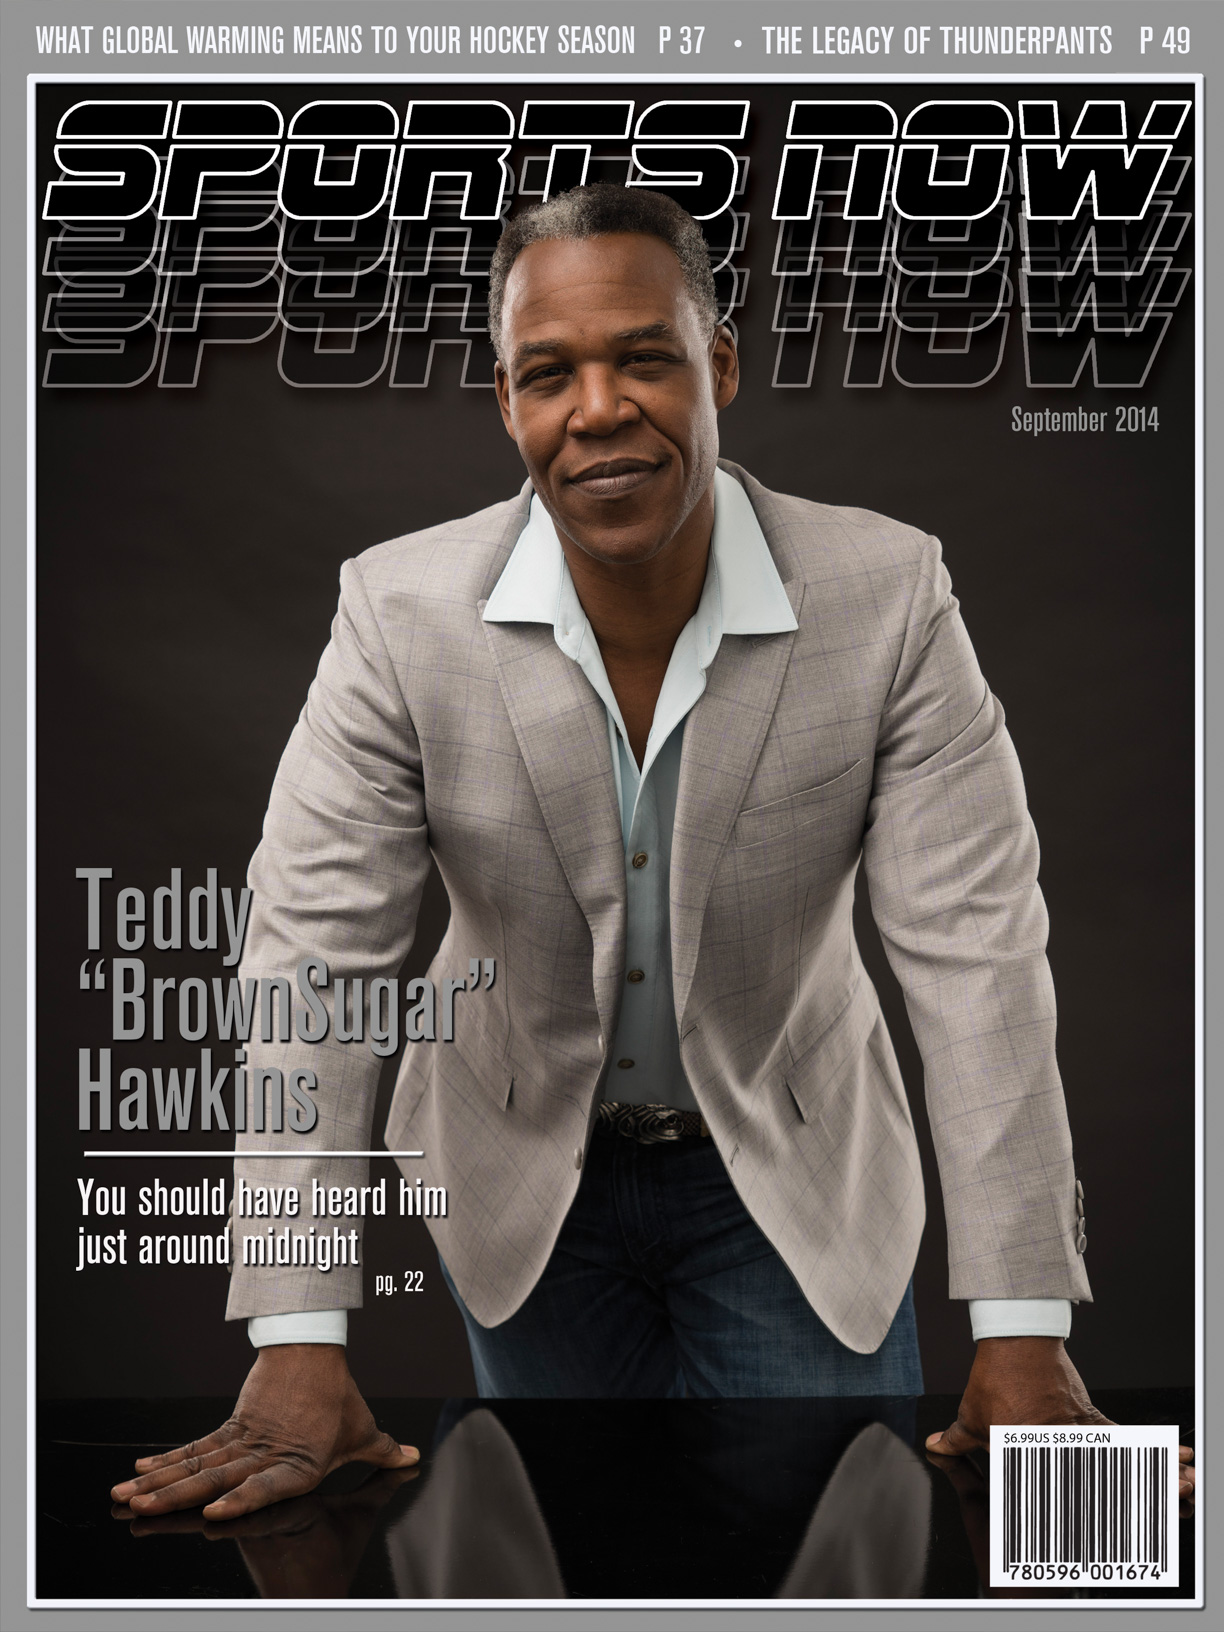 Magazine_Sports_Teddy.jpg